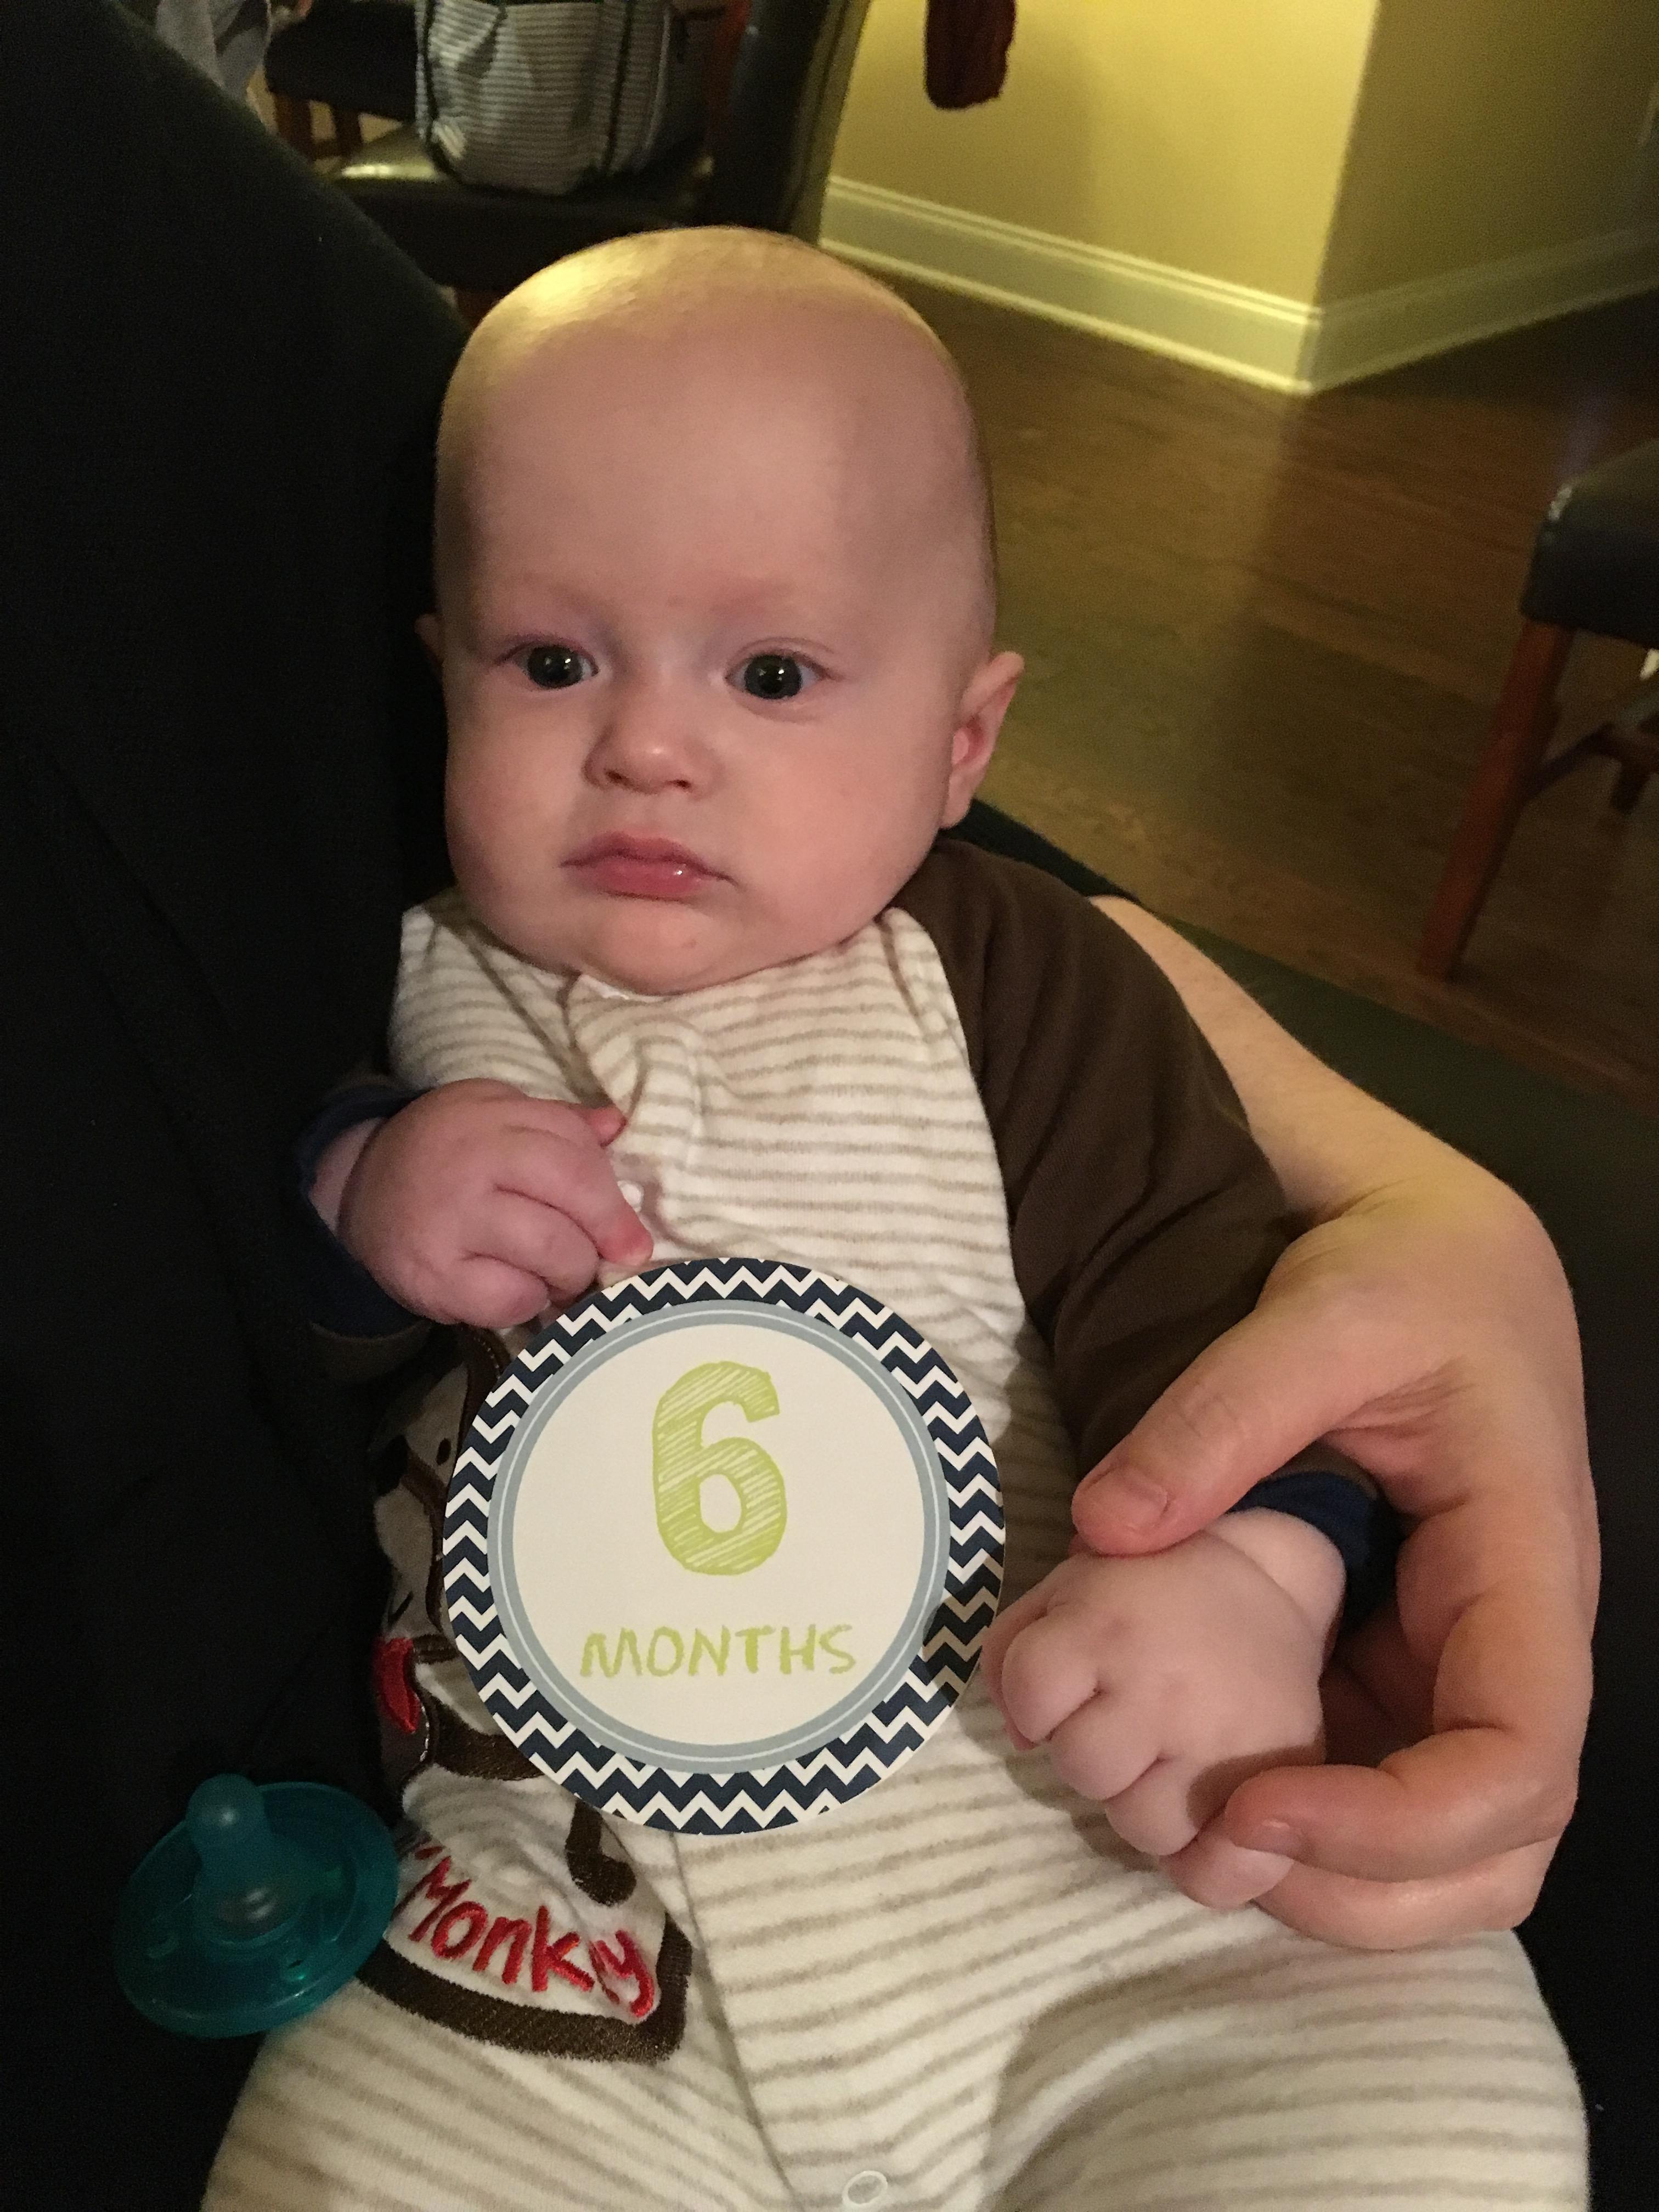 Spencer at 6 months old.